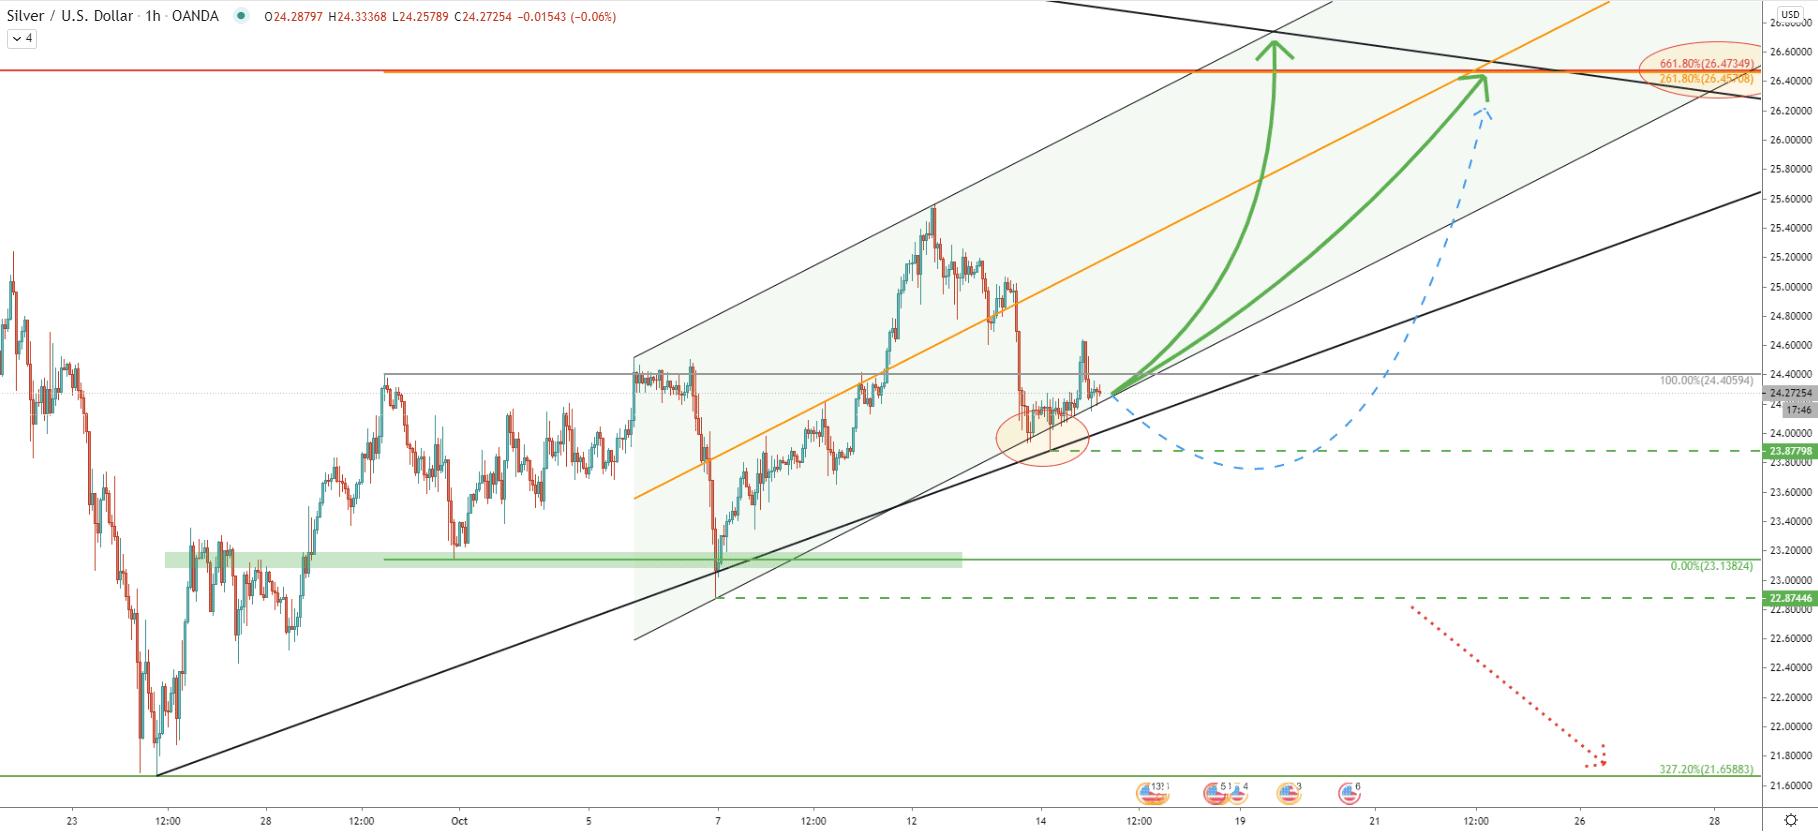 XAG/USD 1-Hour Technical Analysis 14 Oct 2020